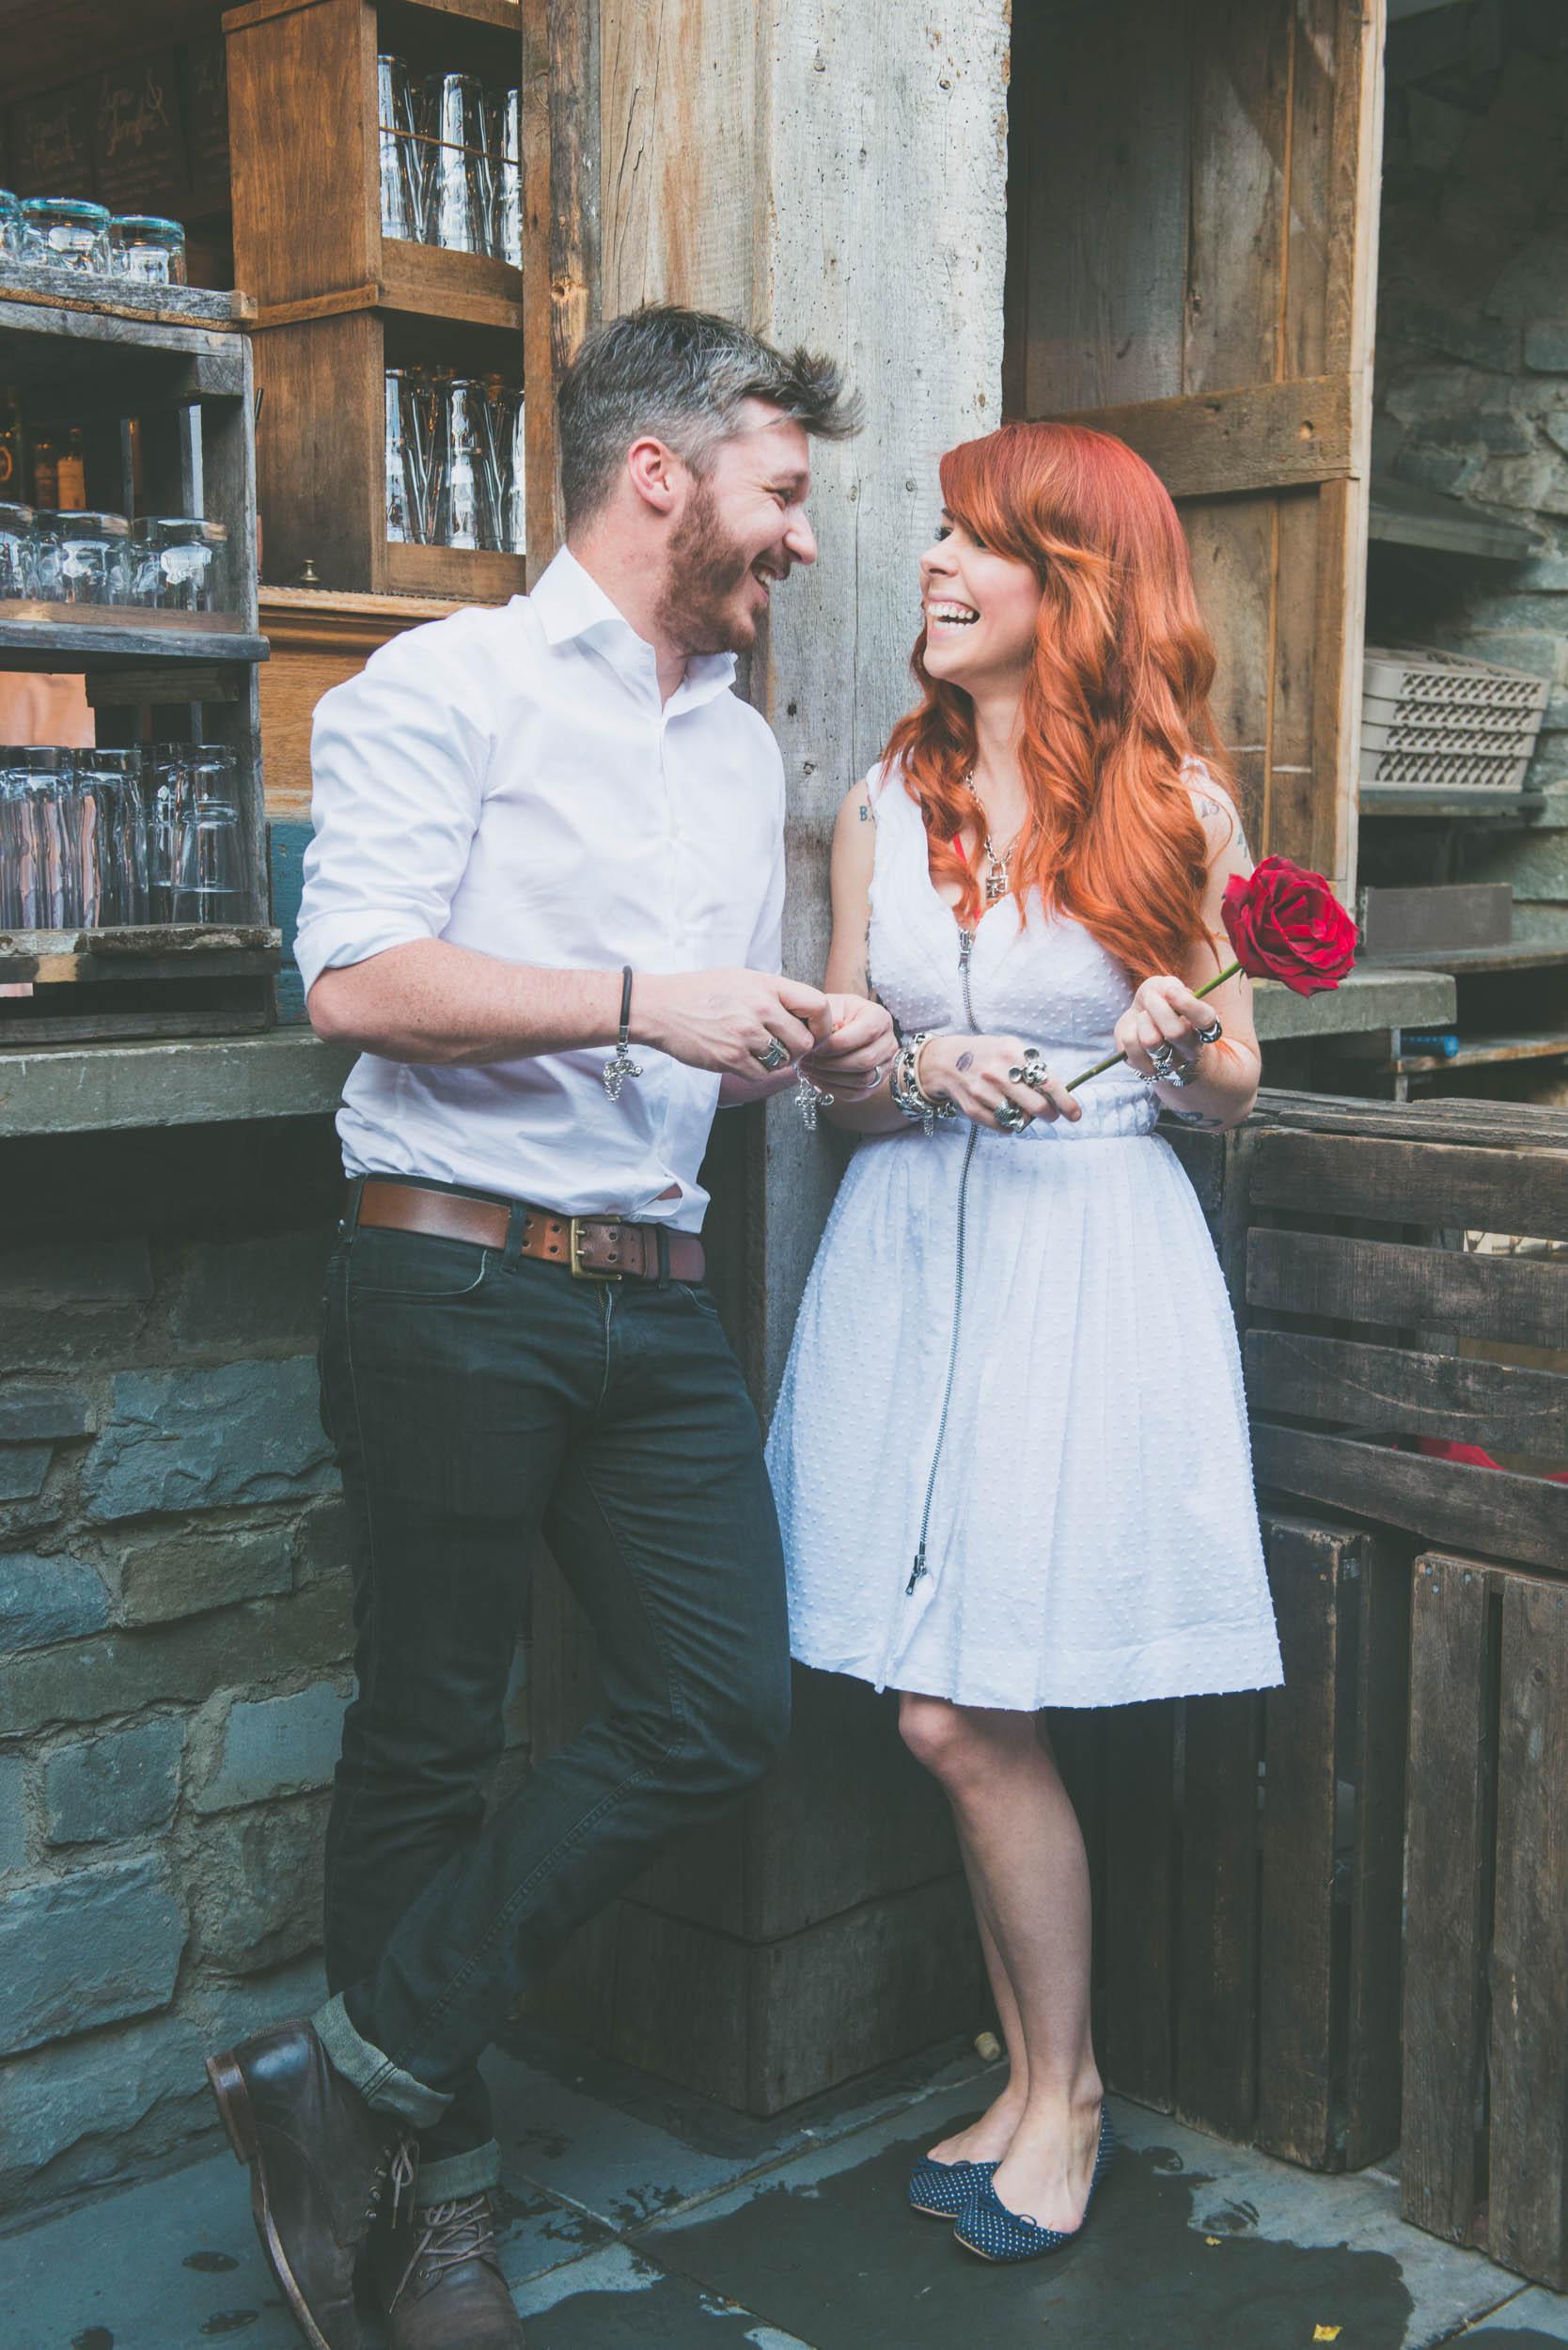 Couple against wood - Engagement portraits -  Photo credit Nicola Bailey.jpg